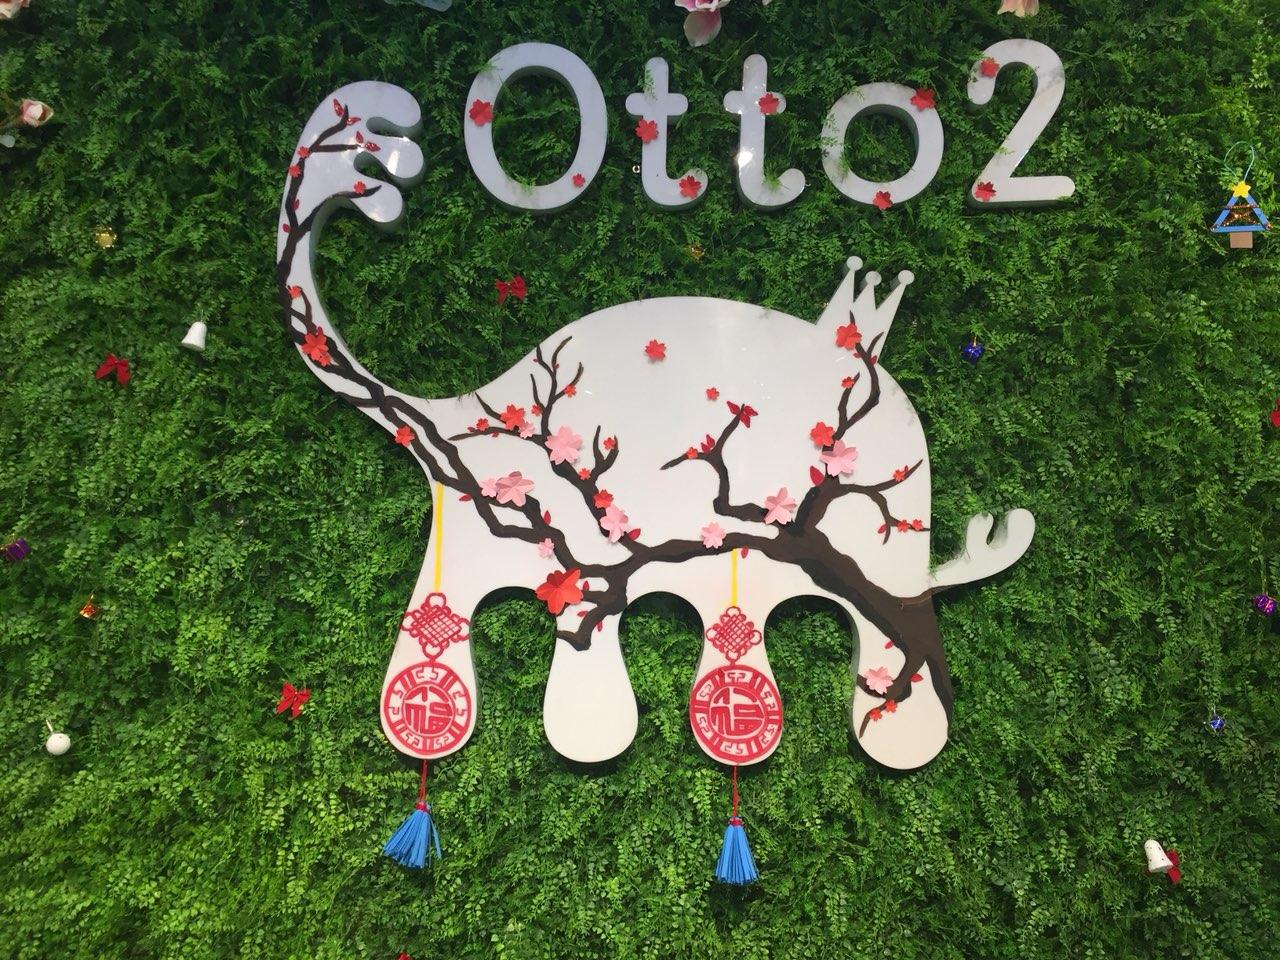 Otto2艺术美学会馆招聘